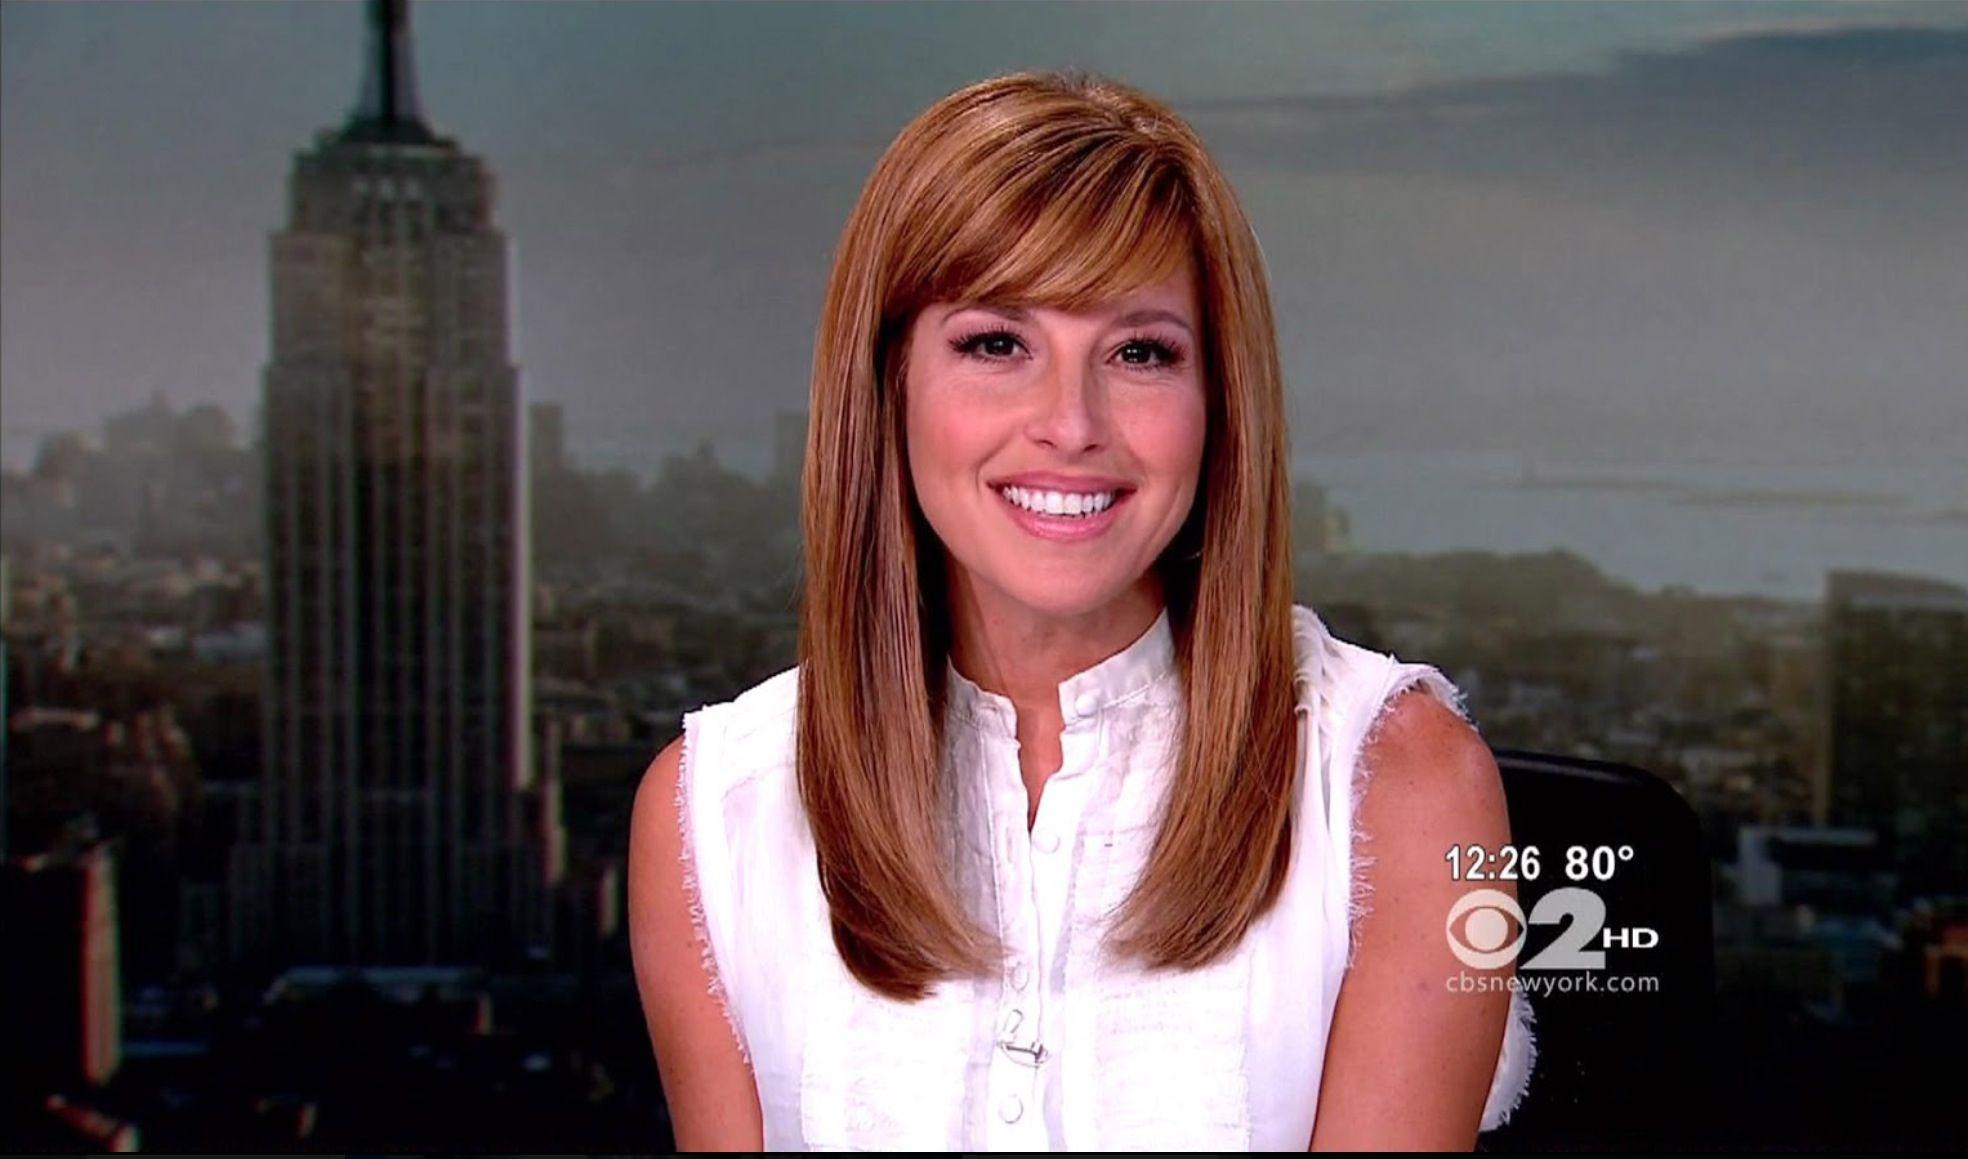 Mary Calvy  CBS New York | News anchors beauty & More